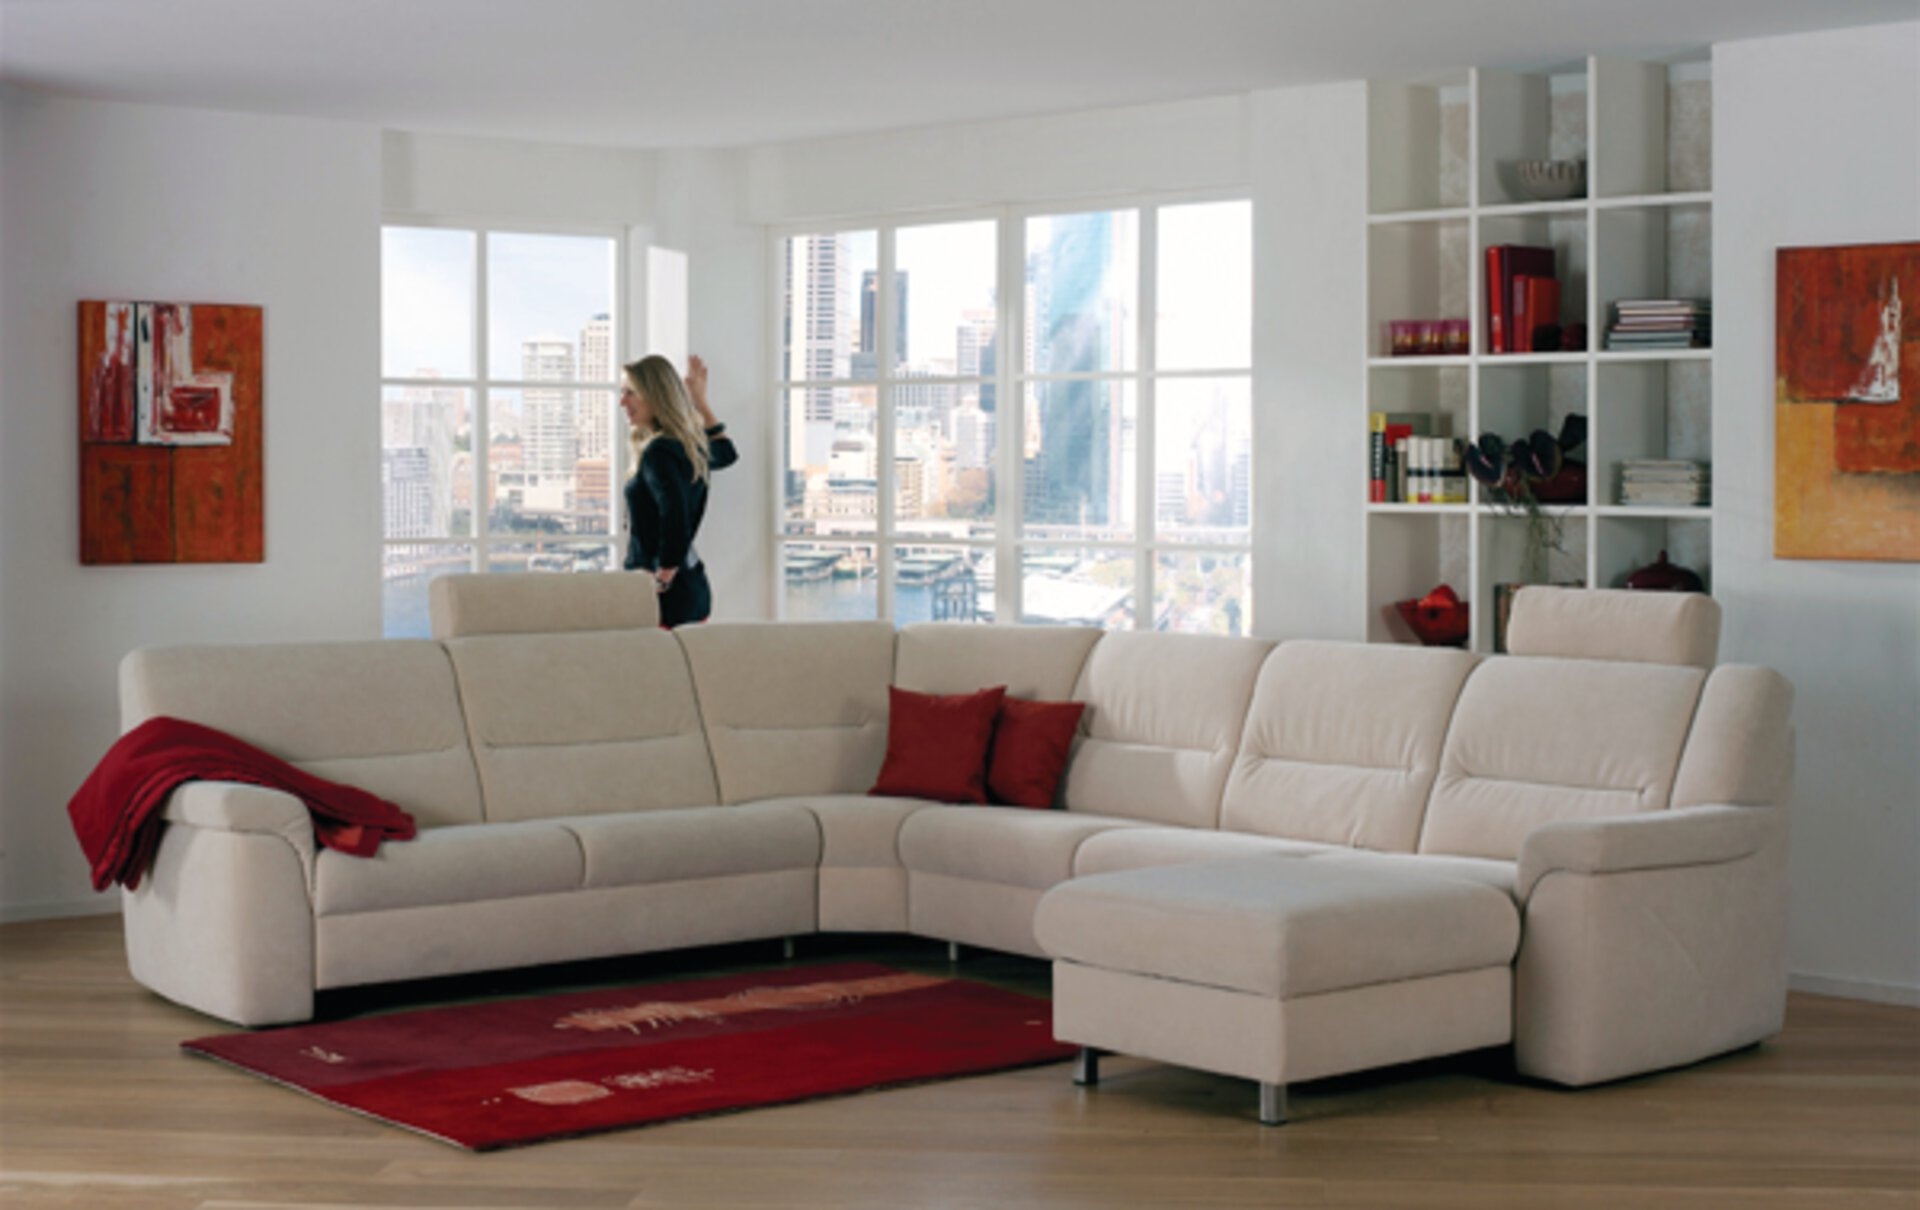 Elementgruppe 1101 BPW Textil beige 227 x 252 x 165 cm